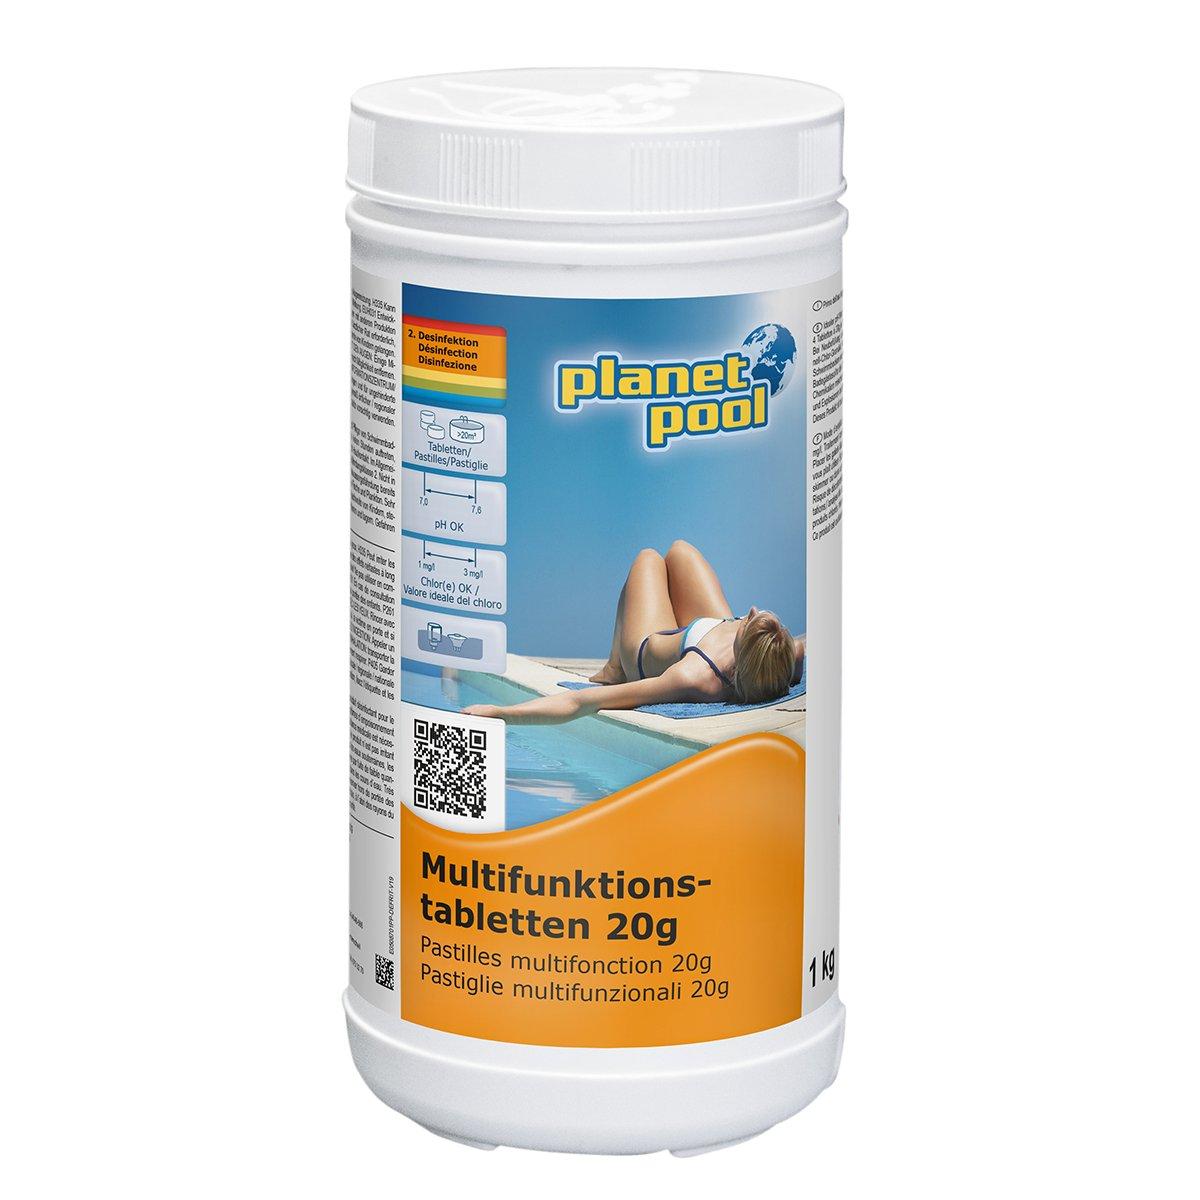 PLANET POOL Multifunktionstabletten 20 g 1 kg